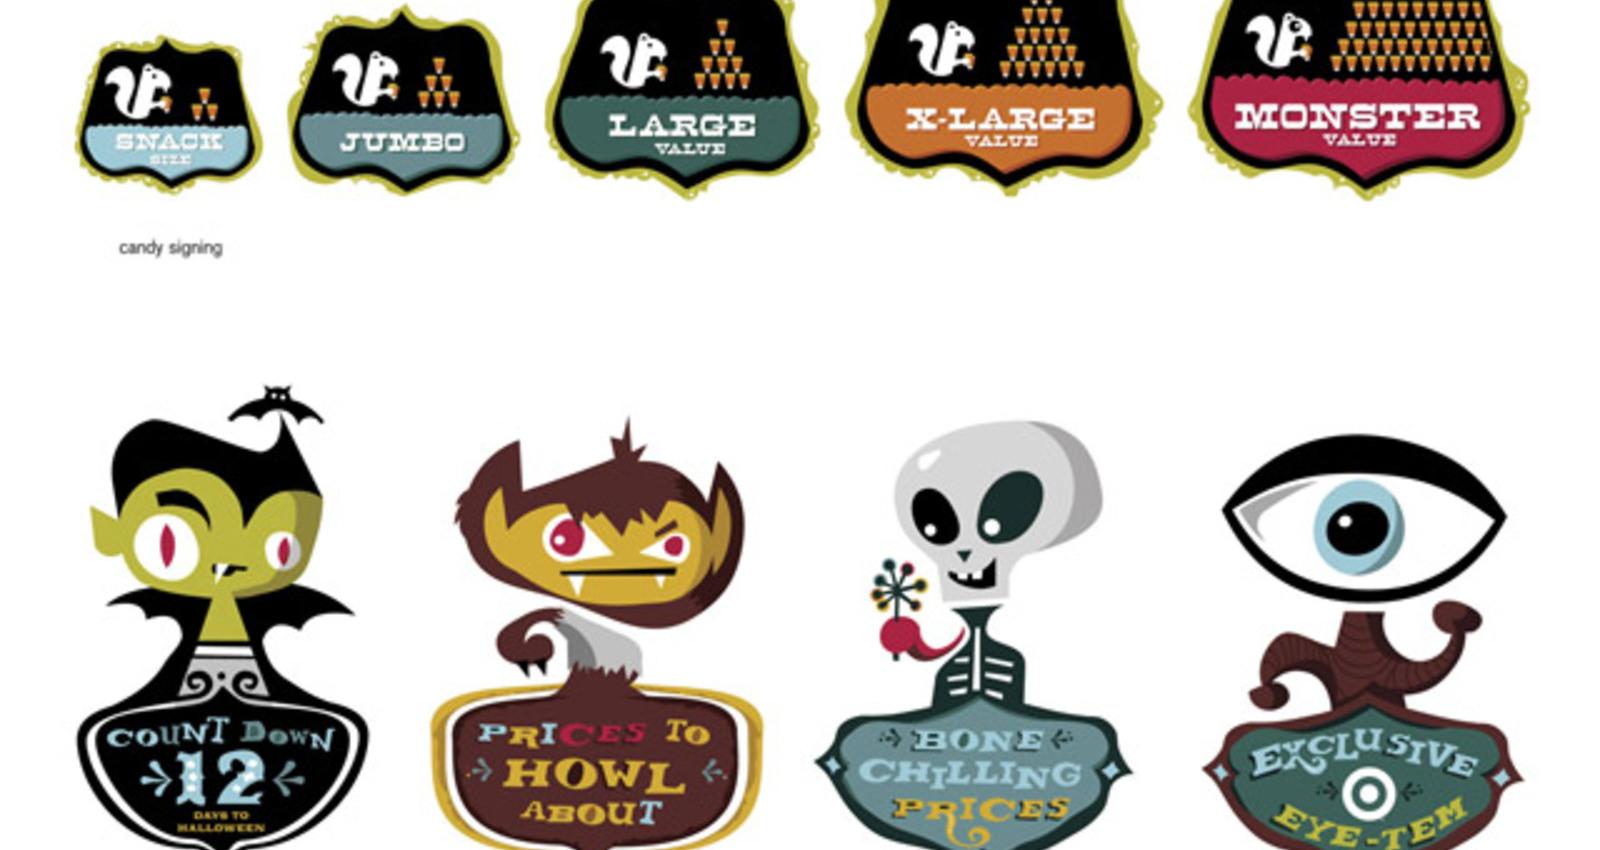 Target Halloween Campaign 2005